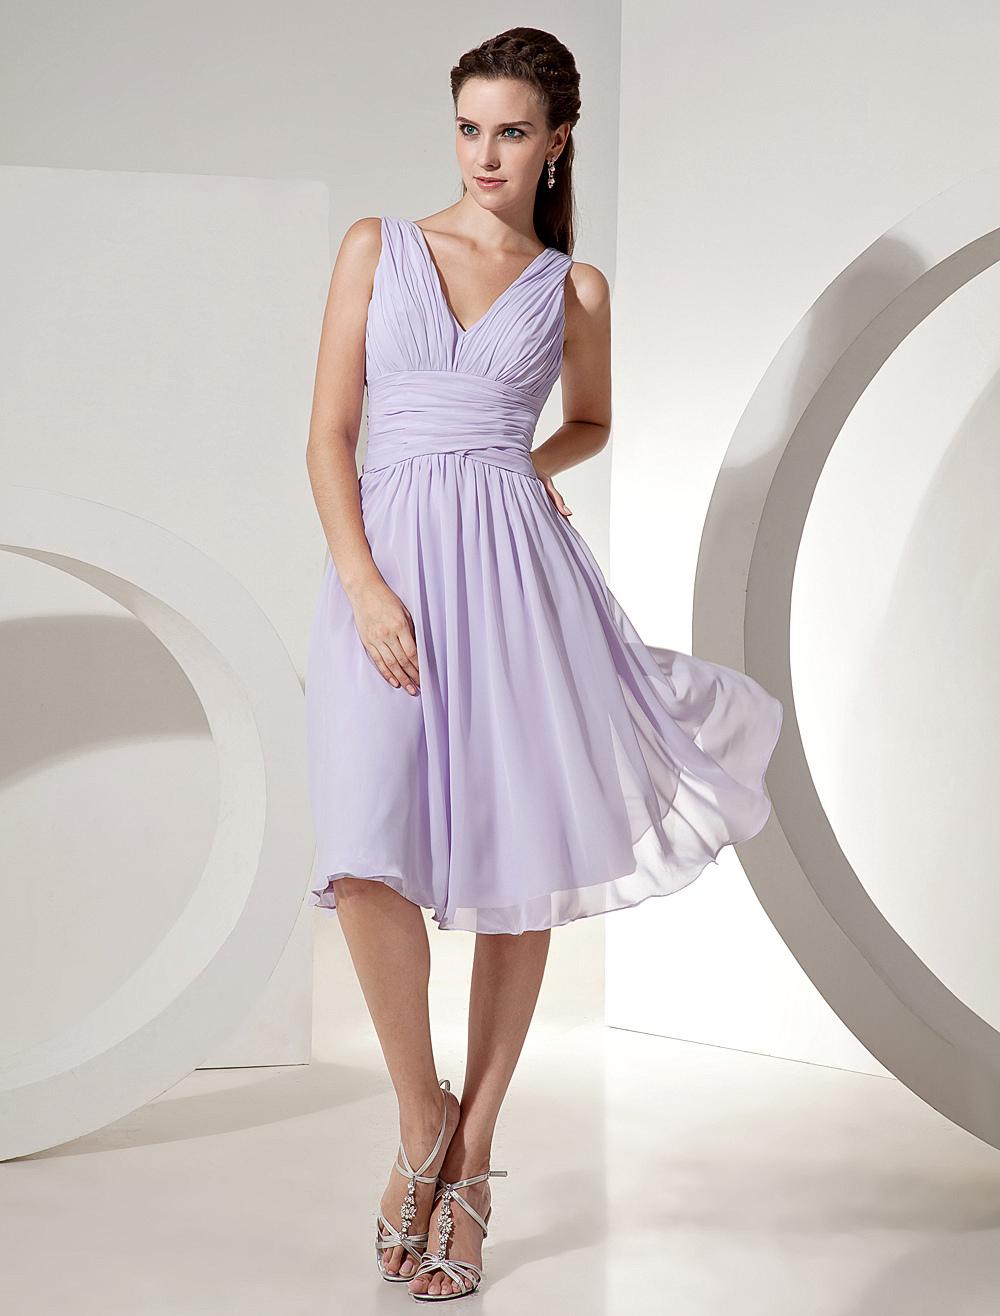 Lilac Bridesmaid Dress V Neck Ruched Chiffon A Line Knee Length Short Prom Dress (Wedding Bridesmaid Dresses) photo